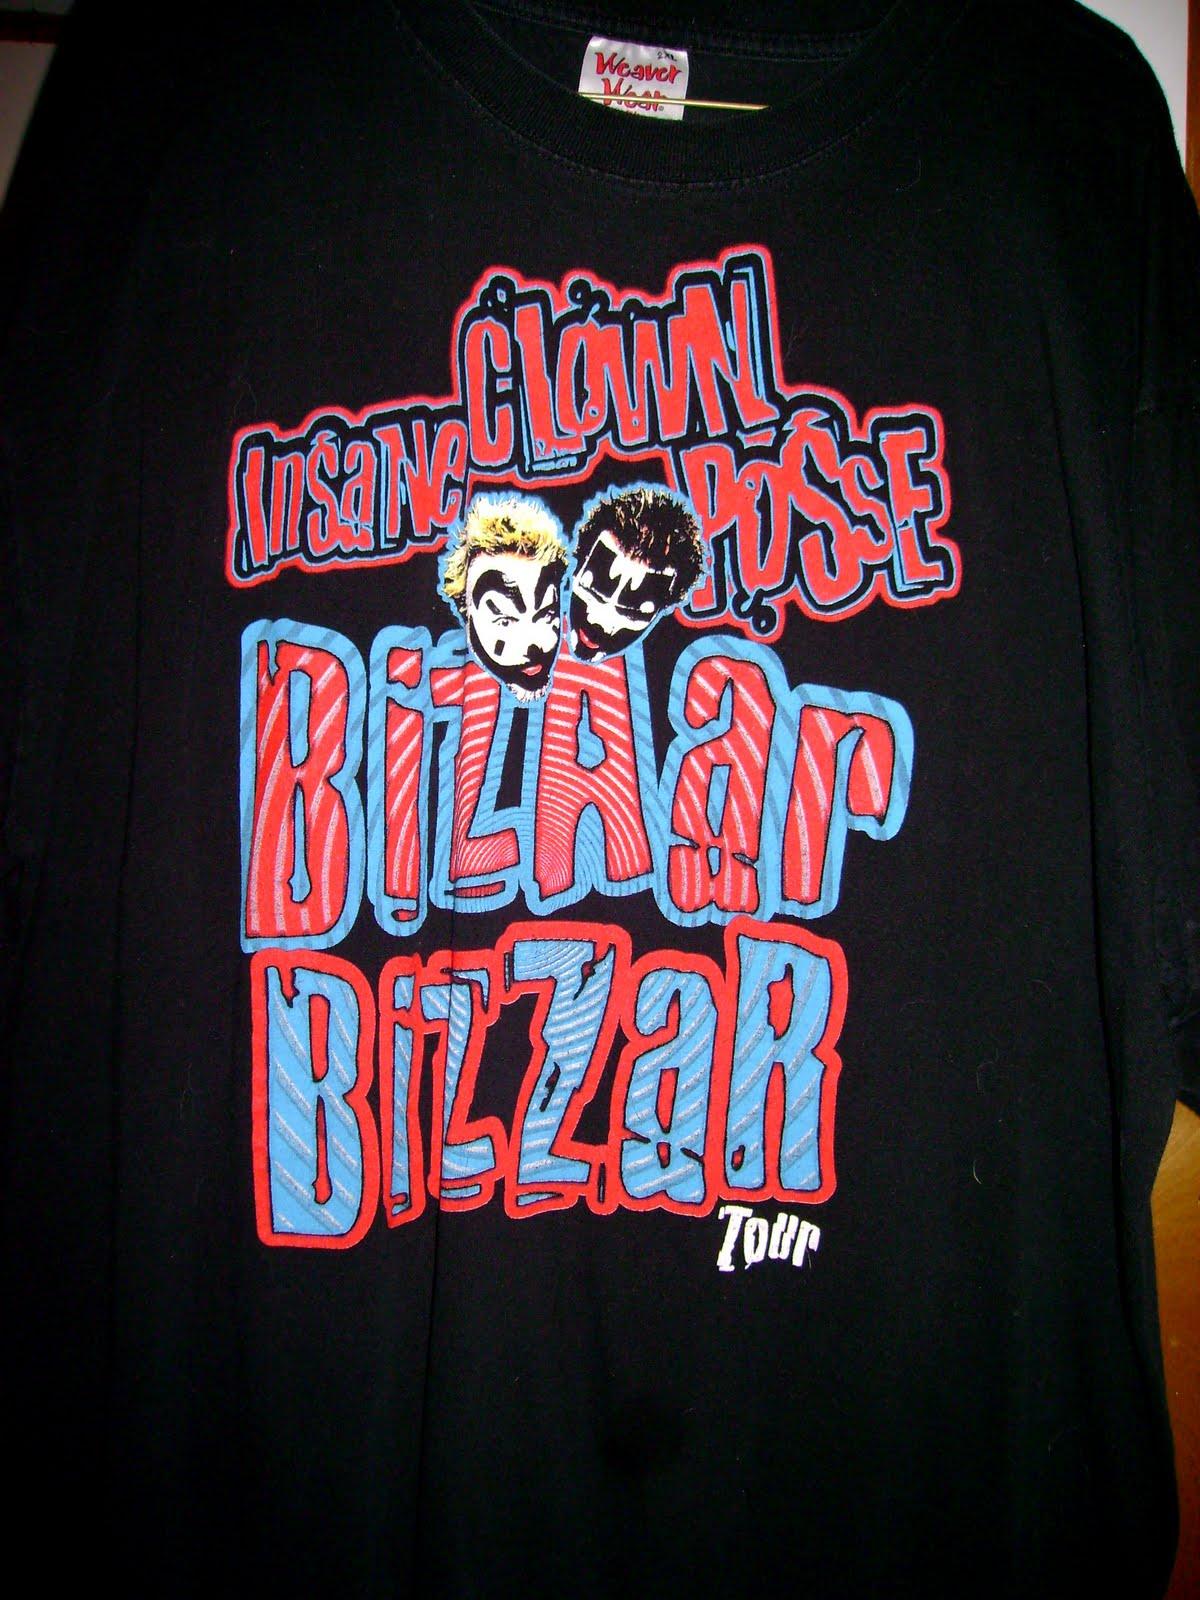 Icp Bizzar Bizaar Tour